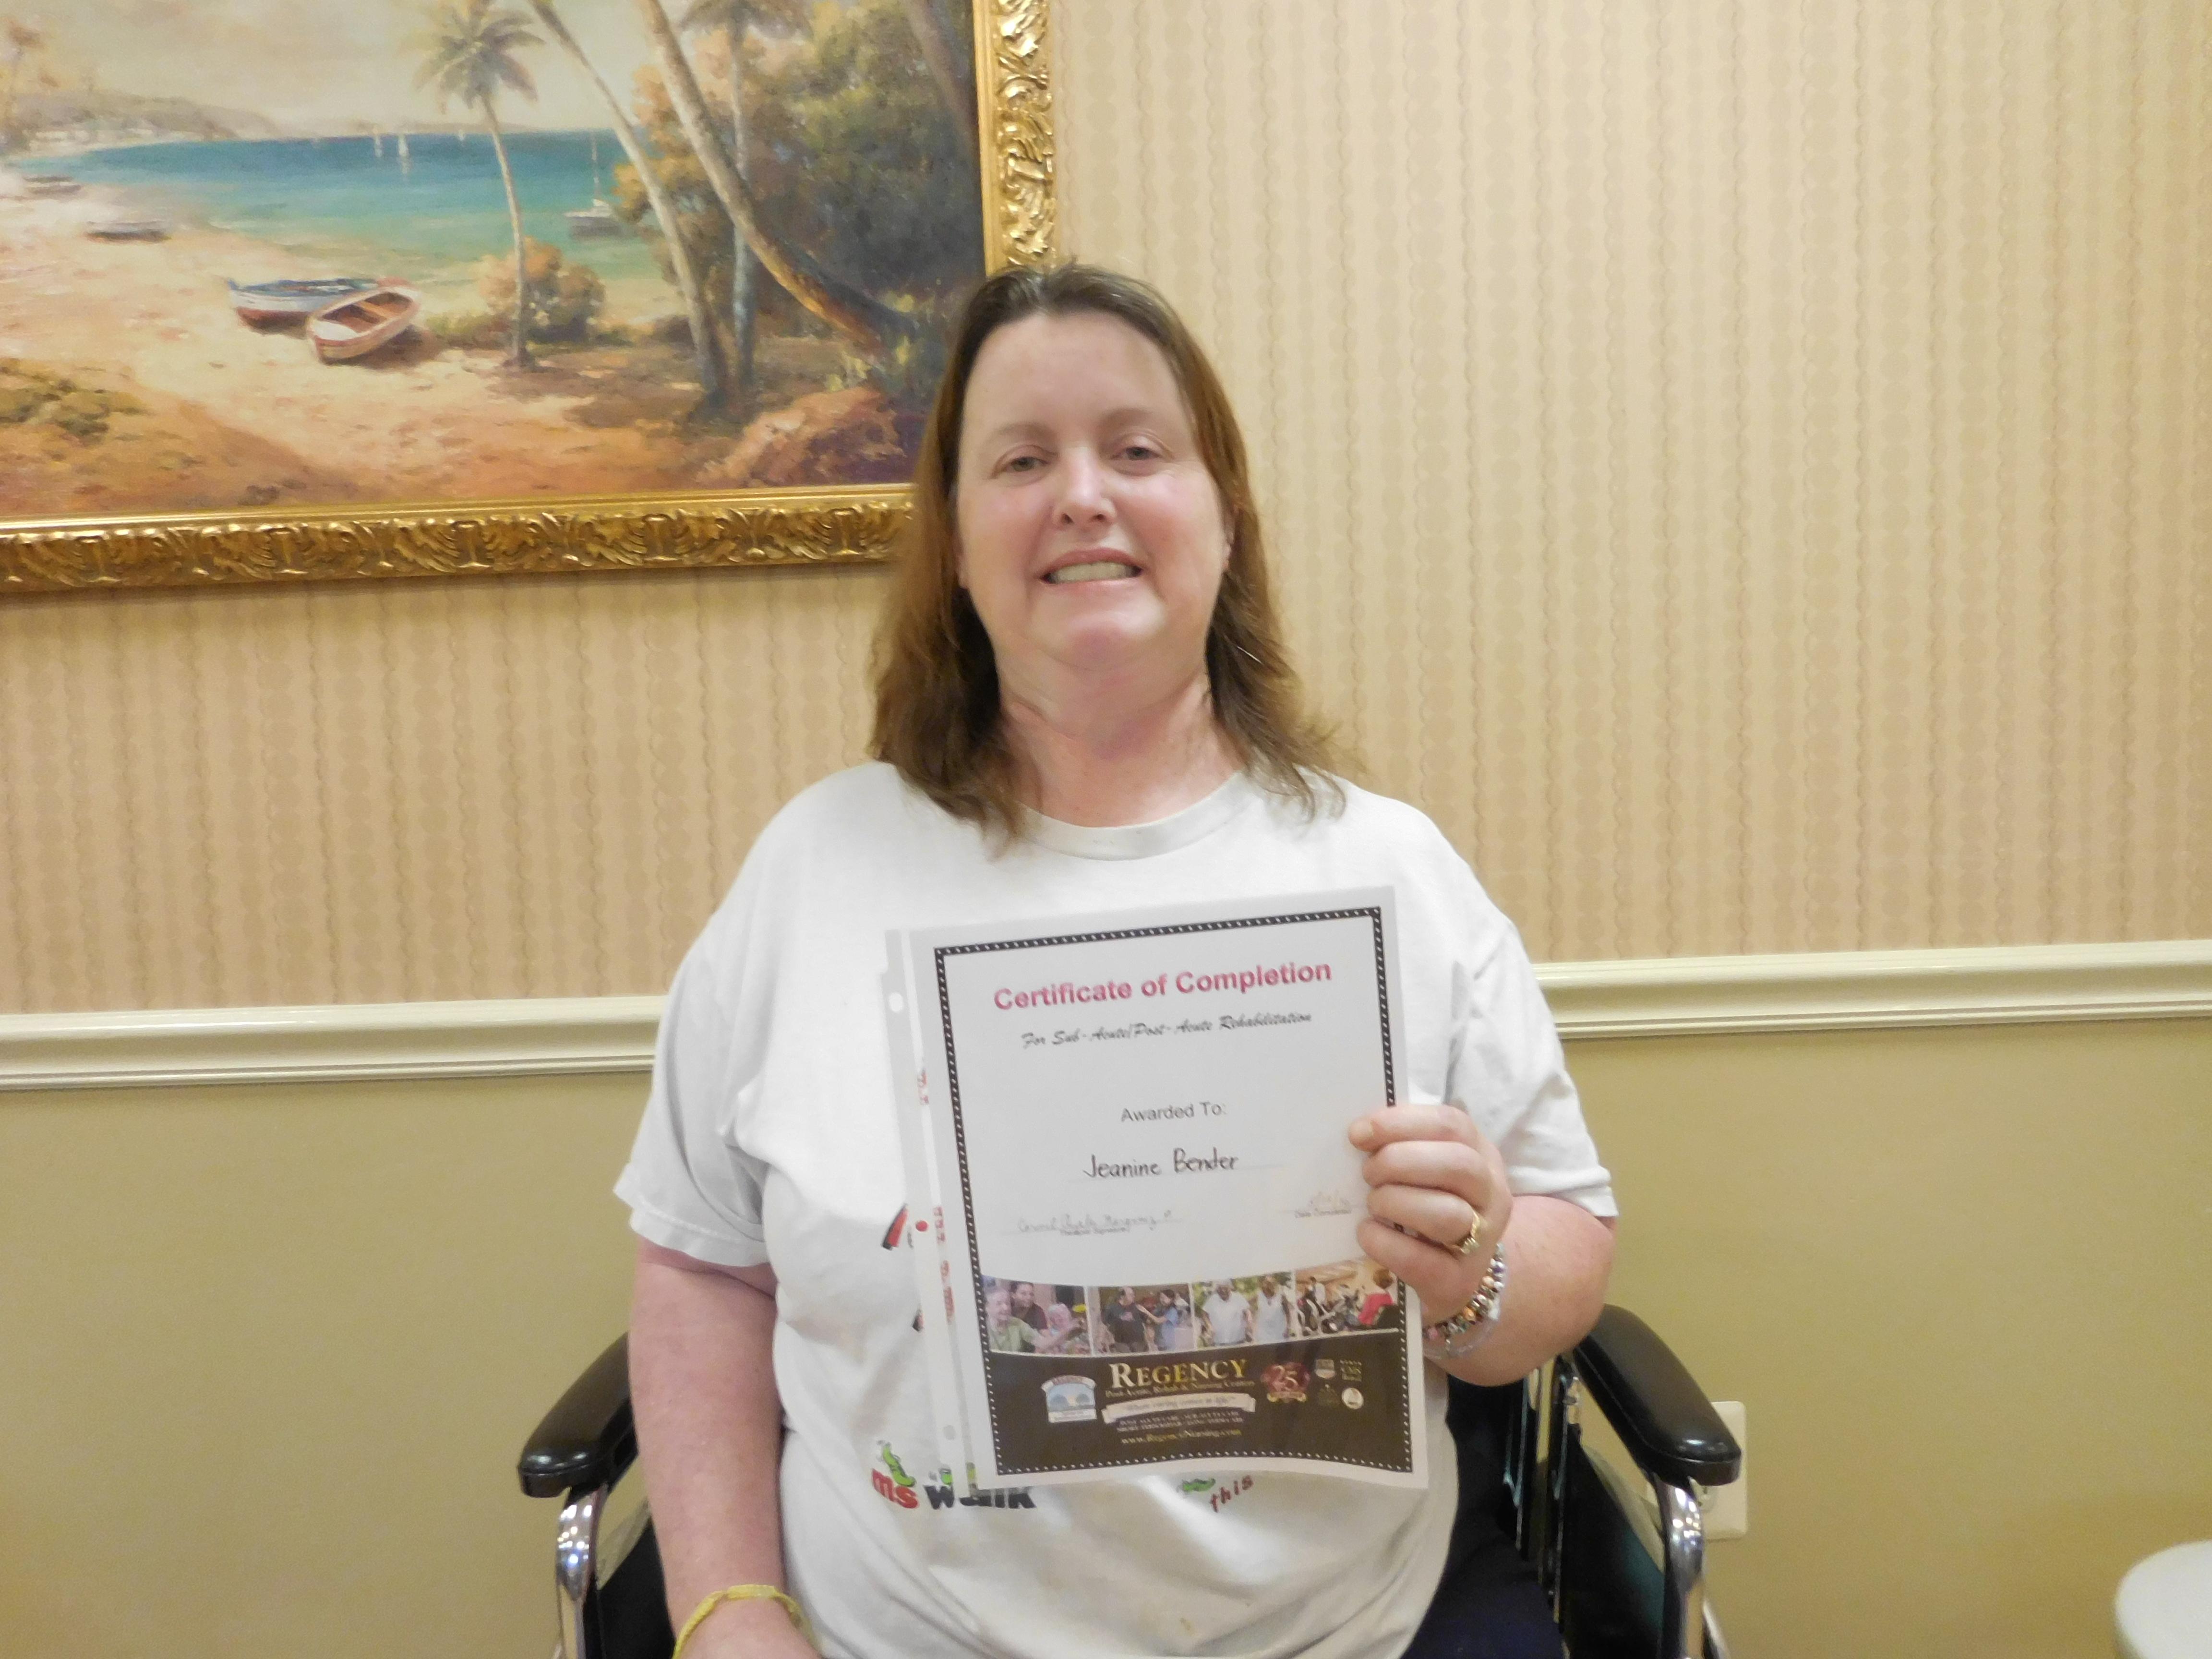 graduate another regency grande success story regency nursing